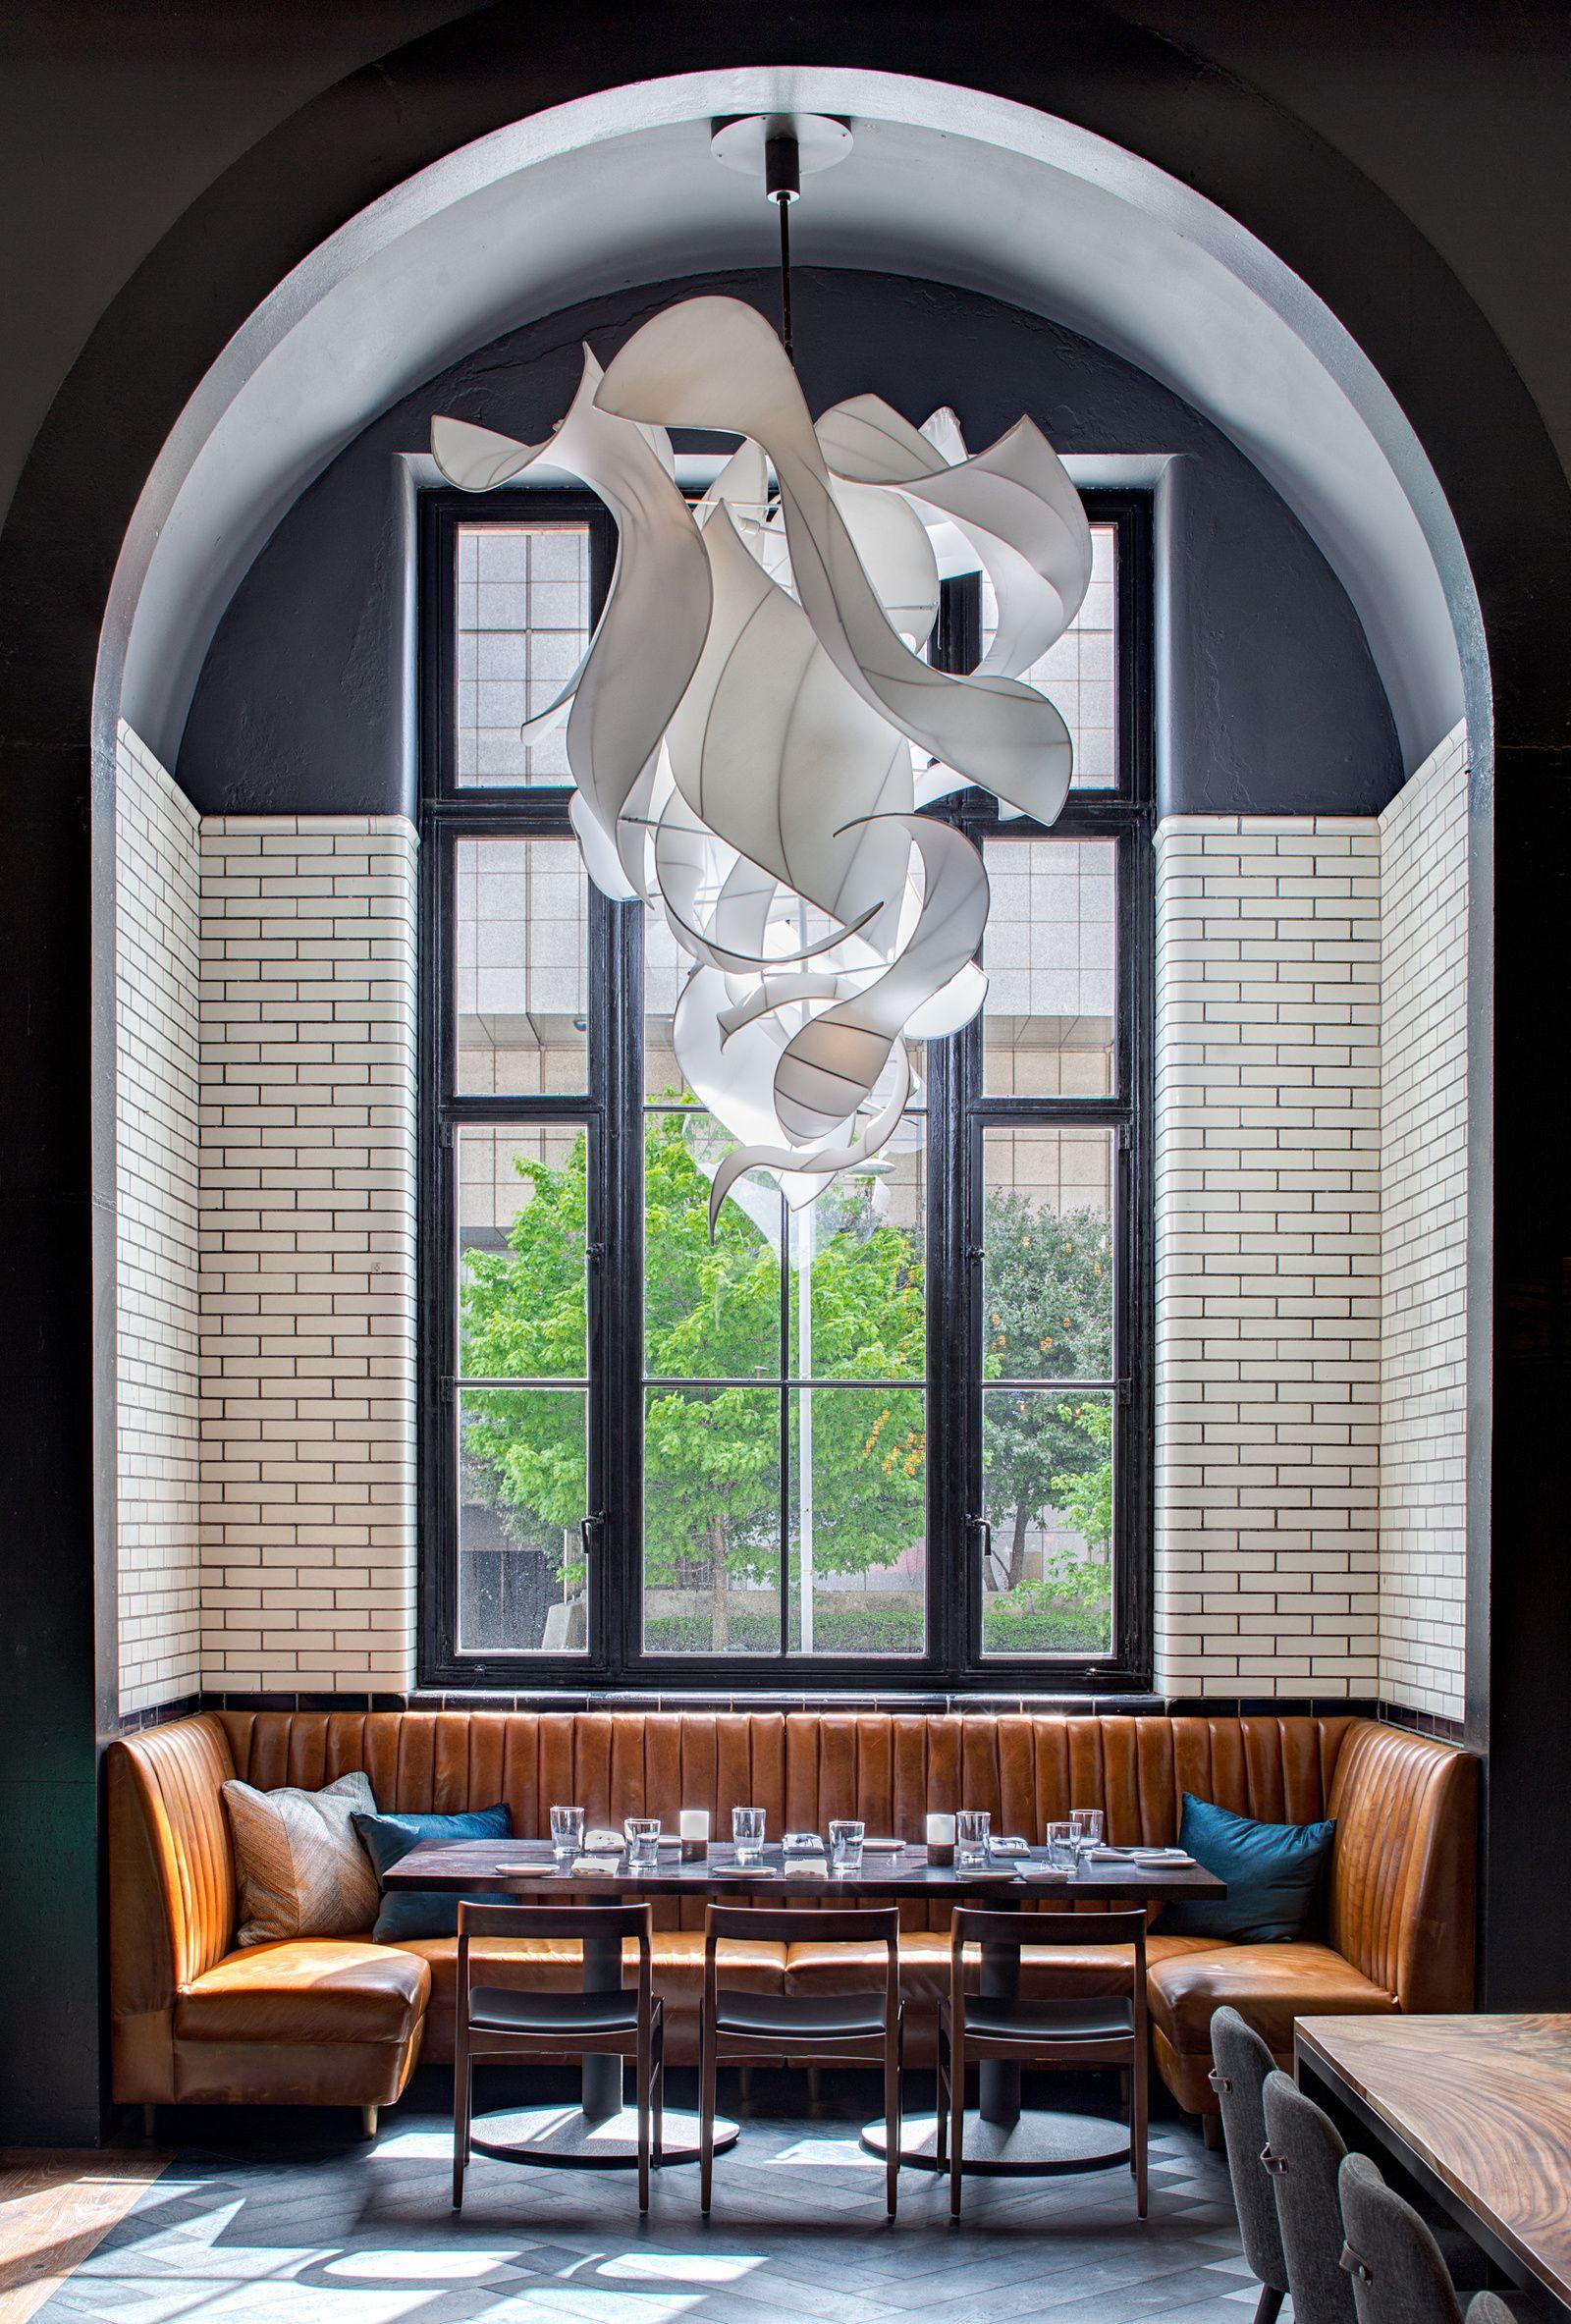 Beautiful Interior Design Addict: Jason Keen Photography / Detroit Architectural  Photographer   DETROIT FOUNDATION HOTEL / PORIS | Interior Design Addict